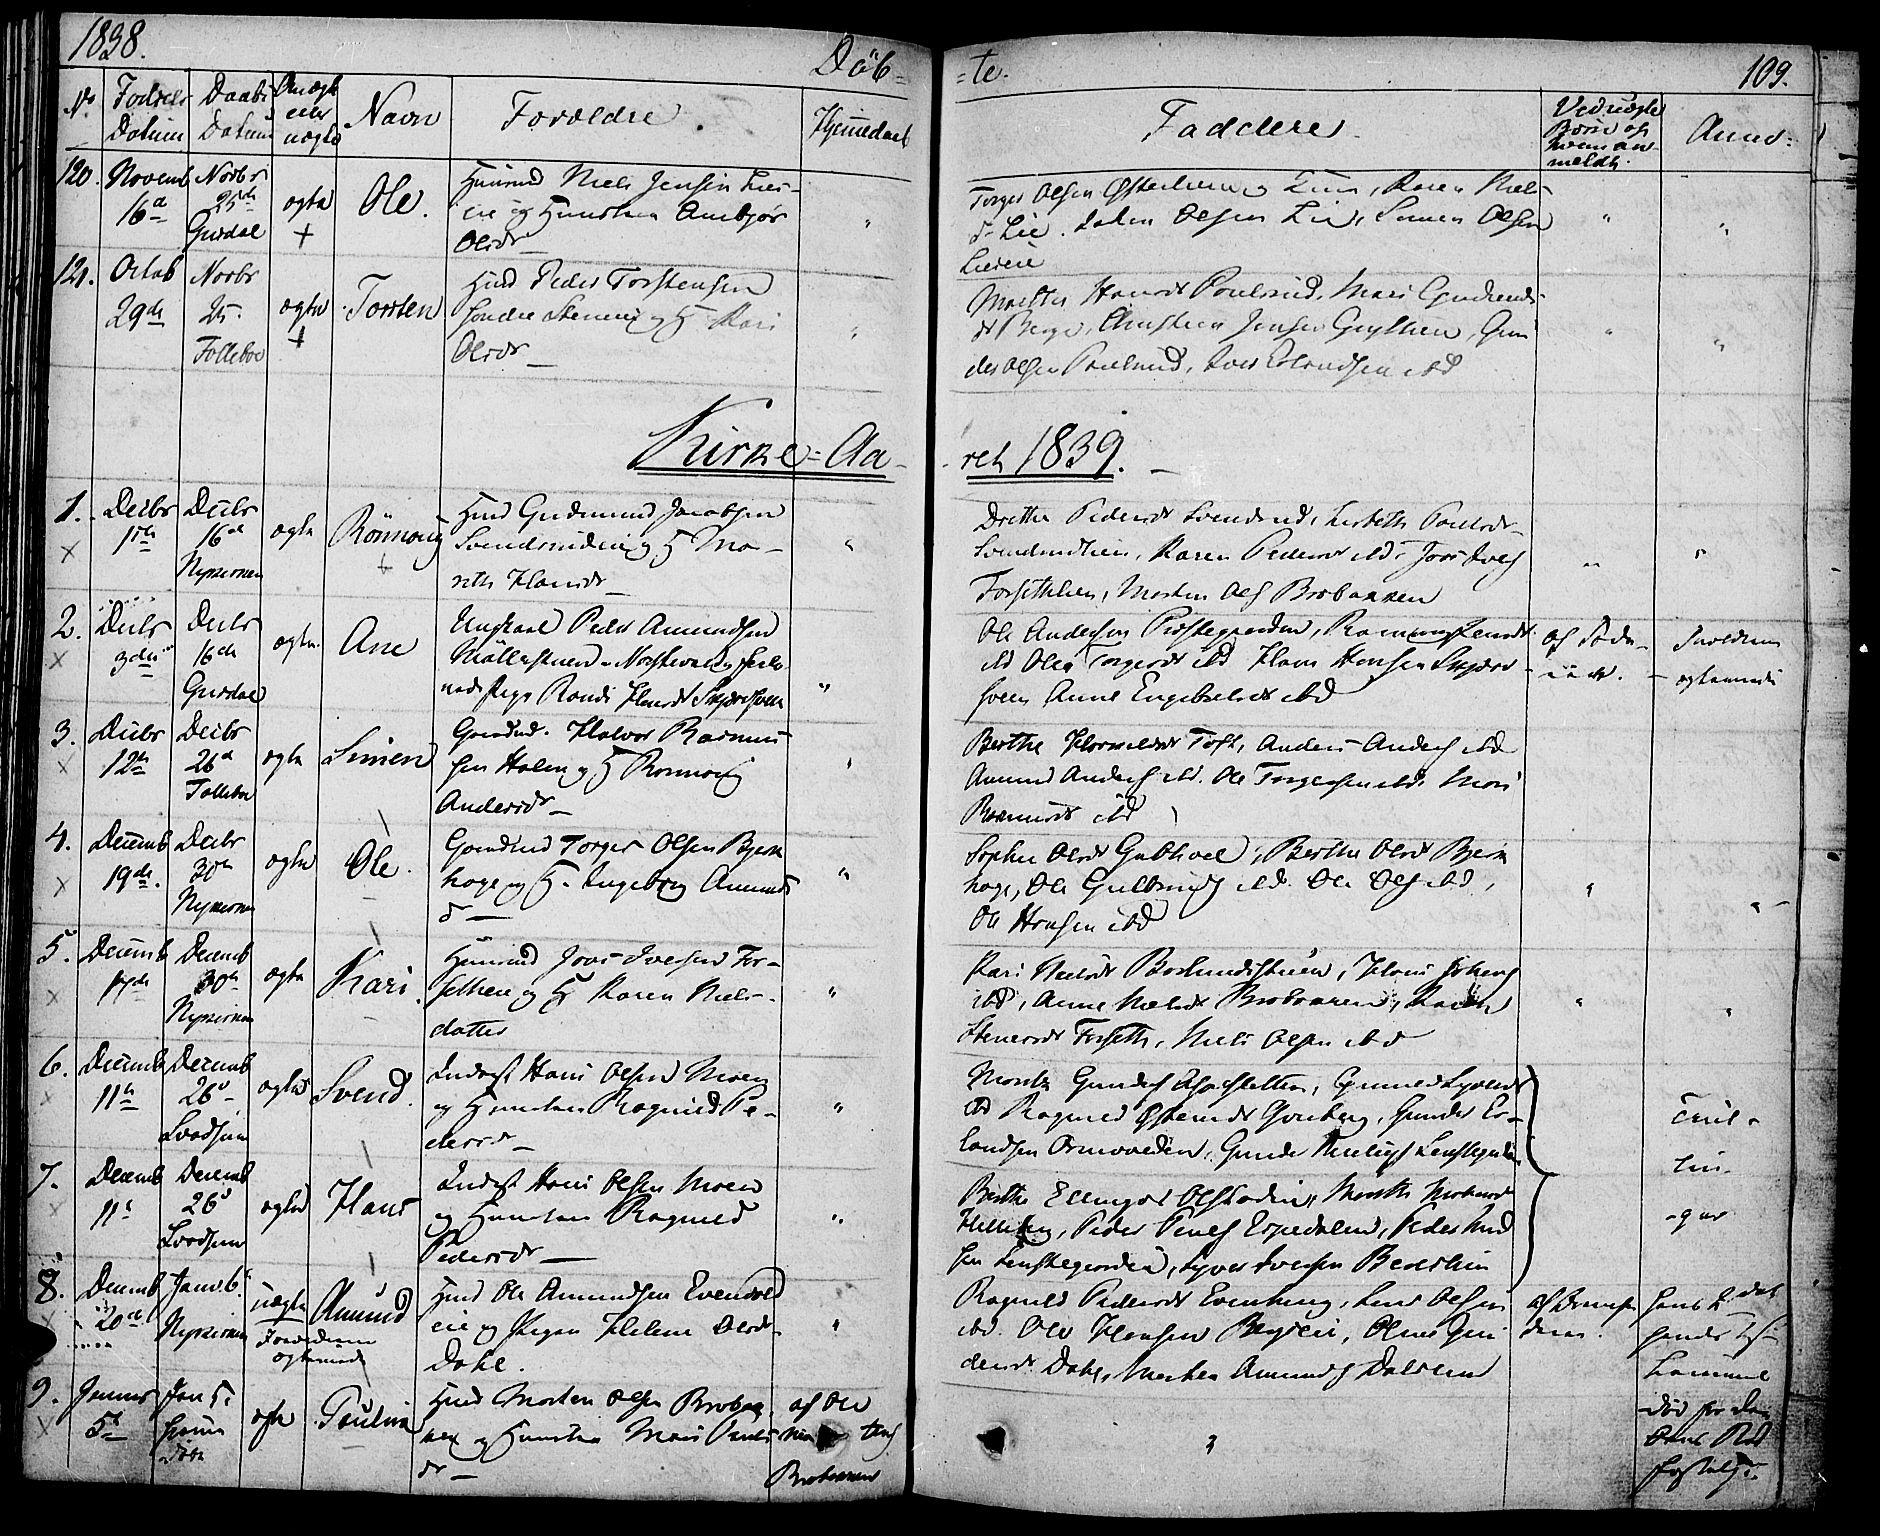 SAH, Gausdal prestekontor, Ministerialbok nr. 6, 1830-1839, s. 109